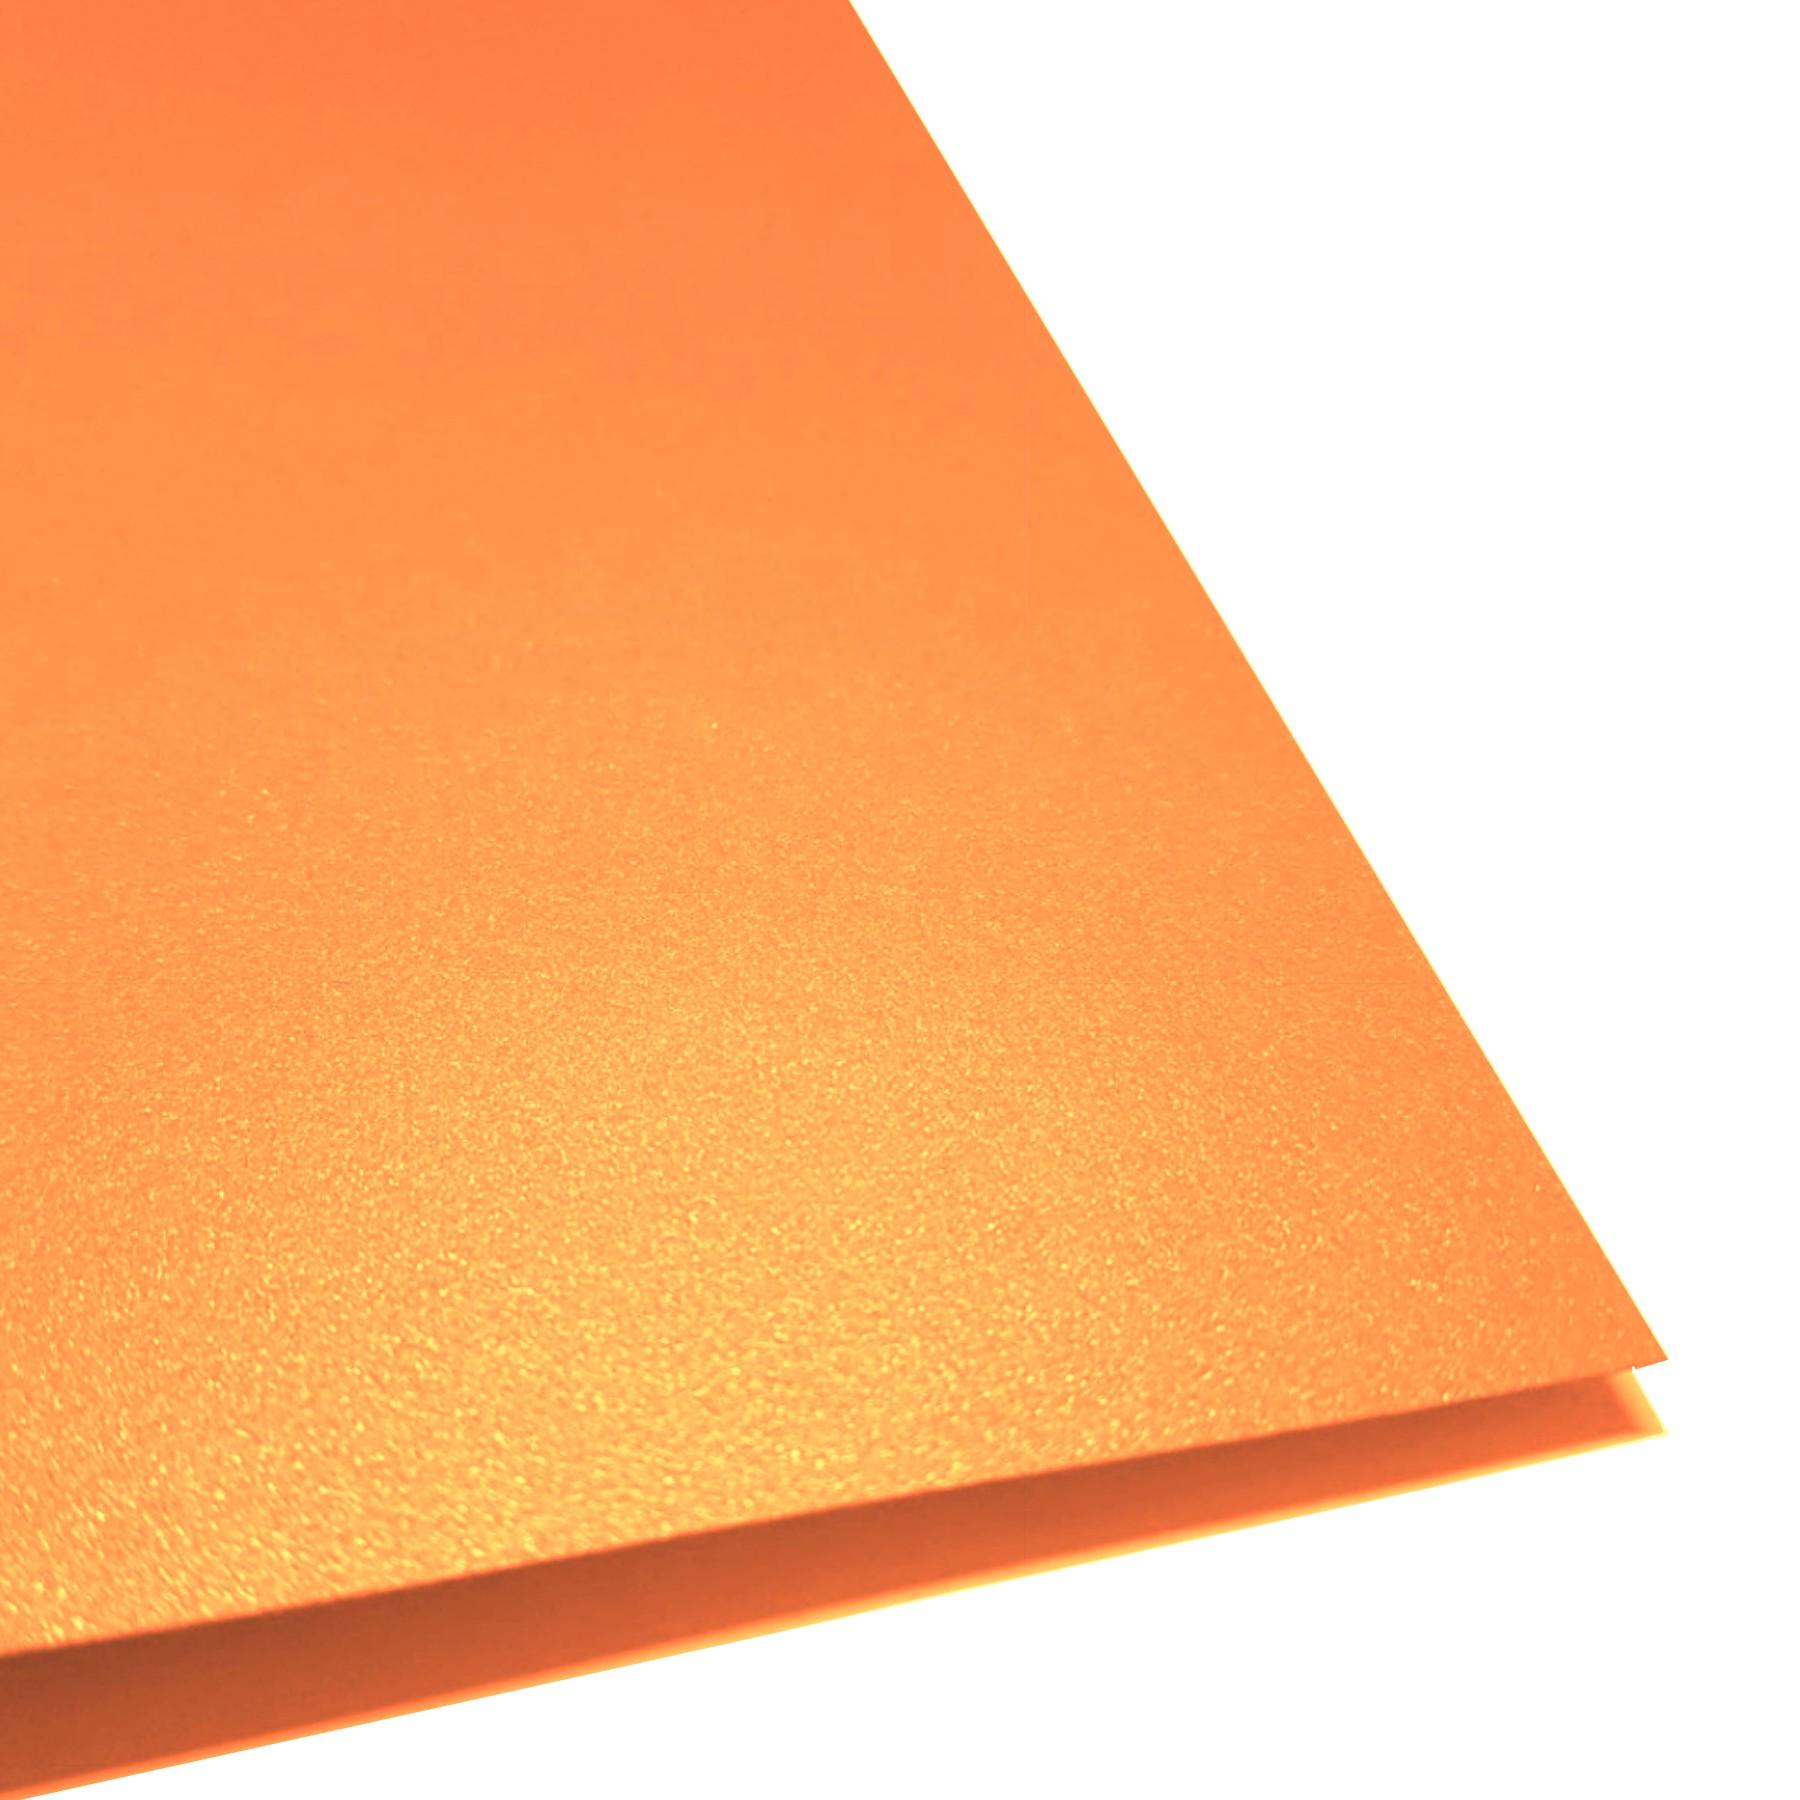 Cartulina perlescente cobre 20 hojas carta